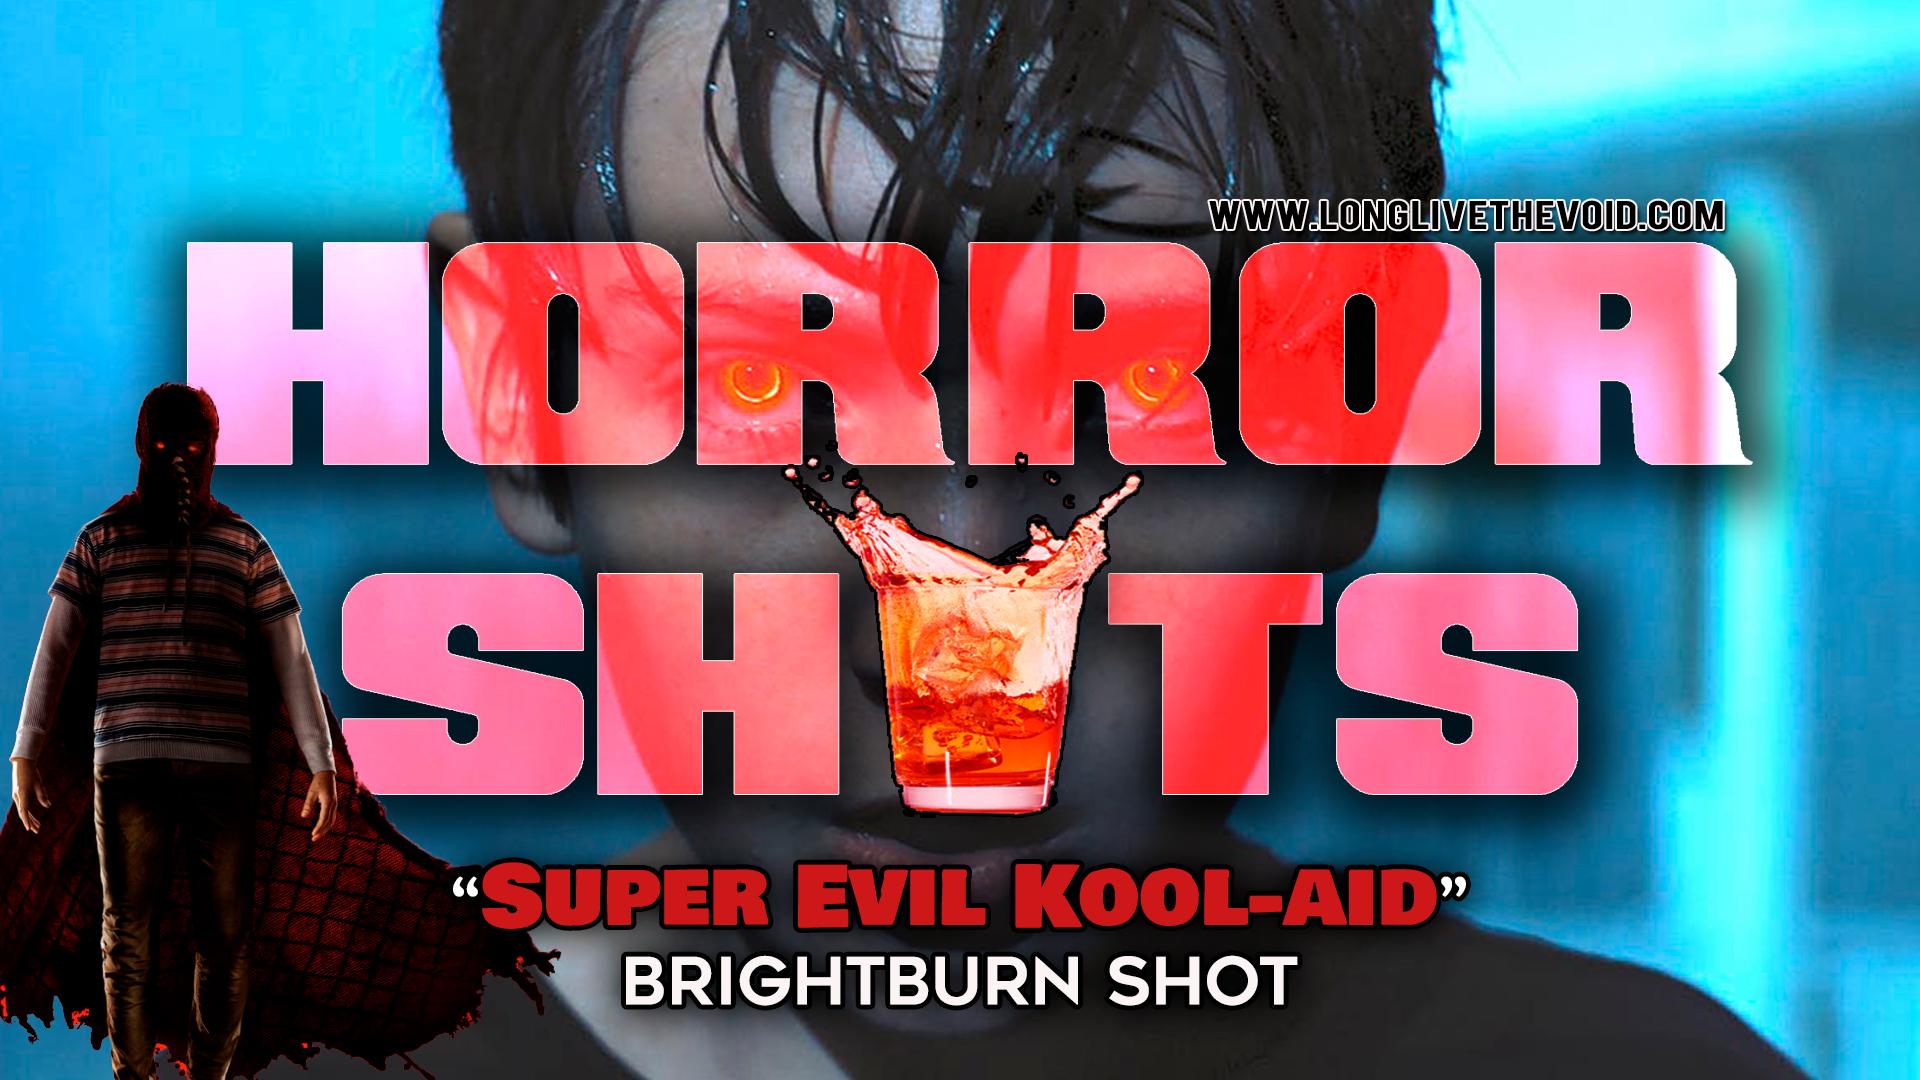 Super-Evil-Kool-Aid-Brightburn-Shot.jpg